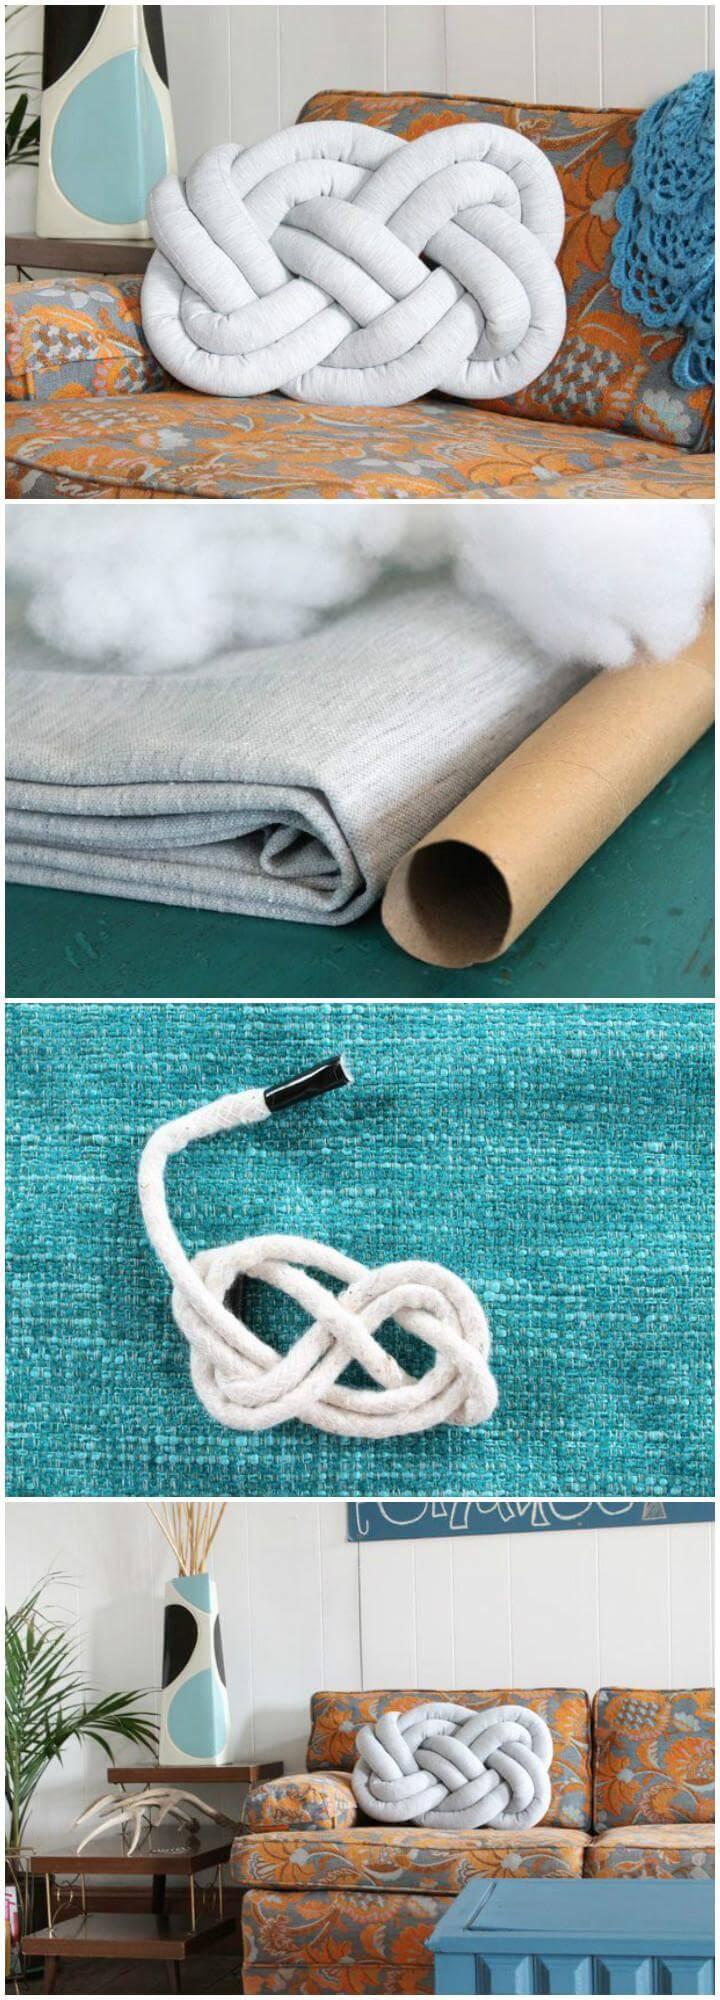 DIY Homemade Knot Pillow